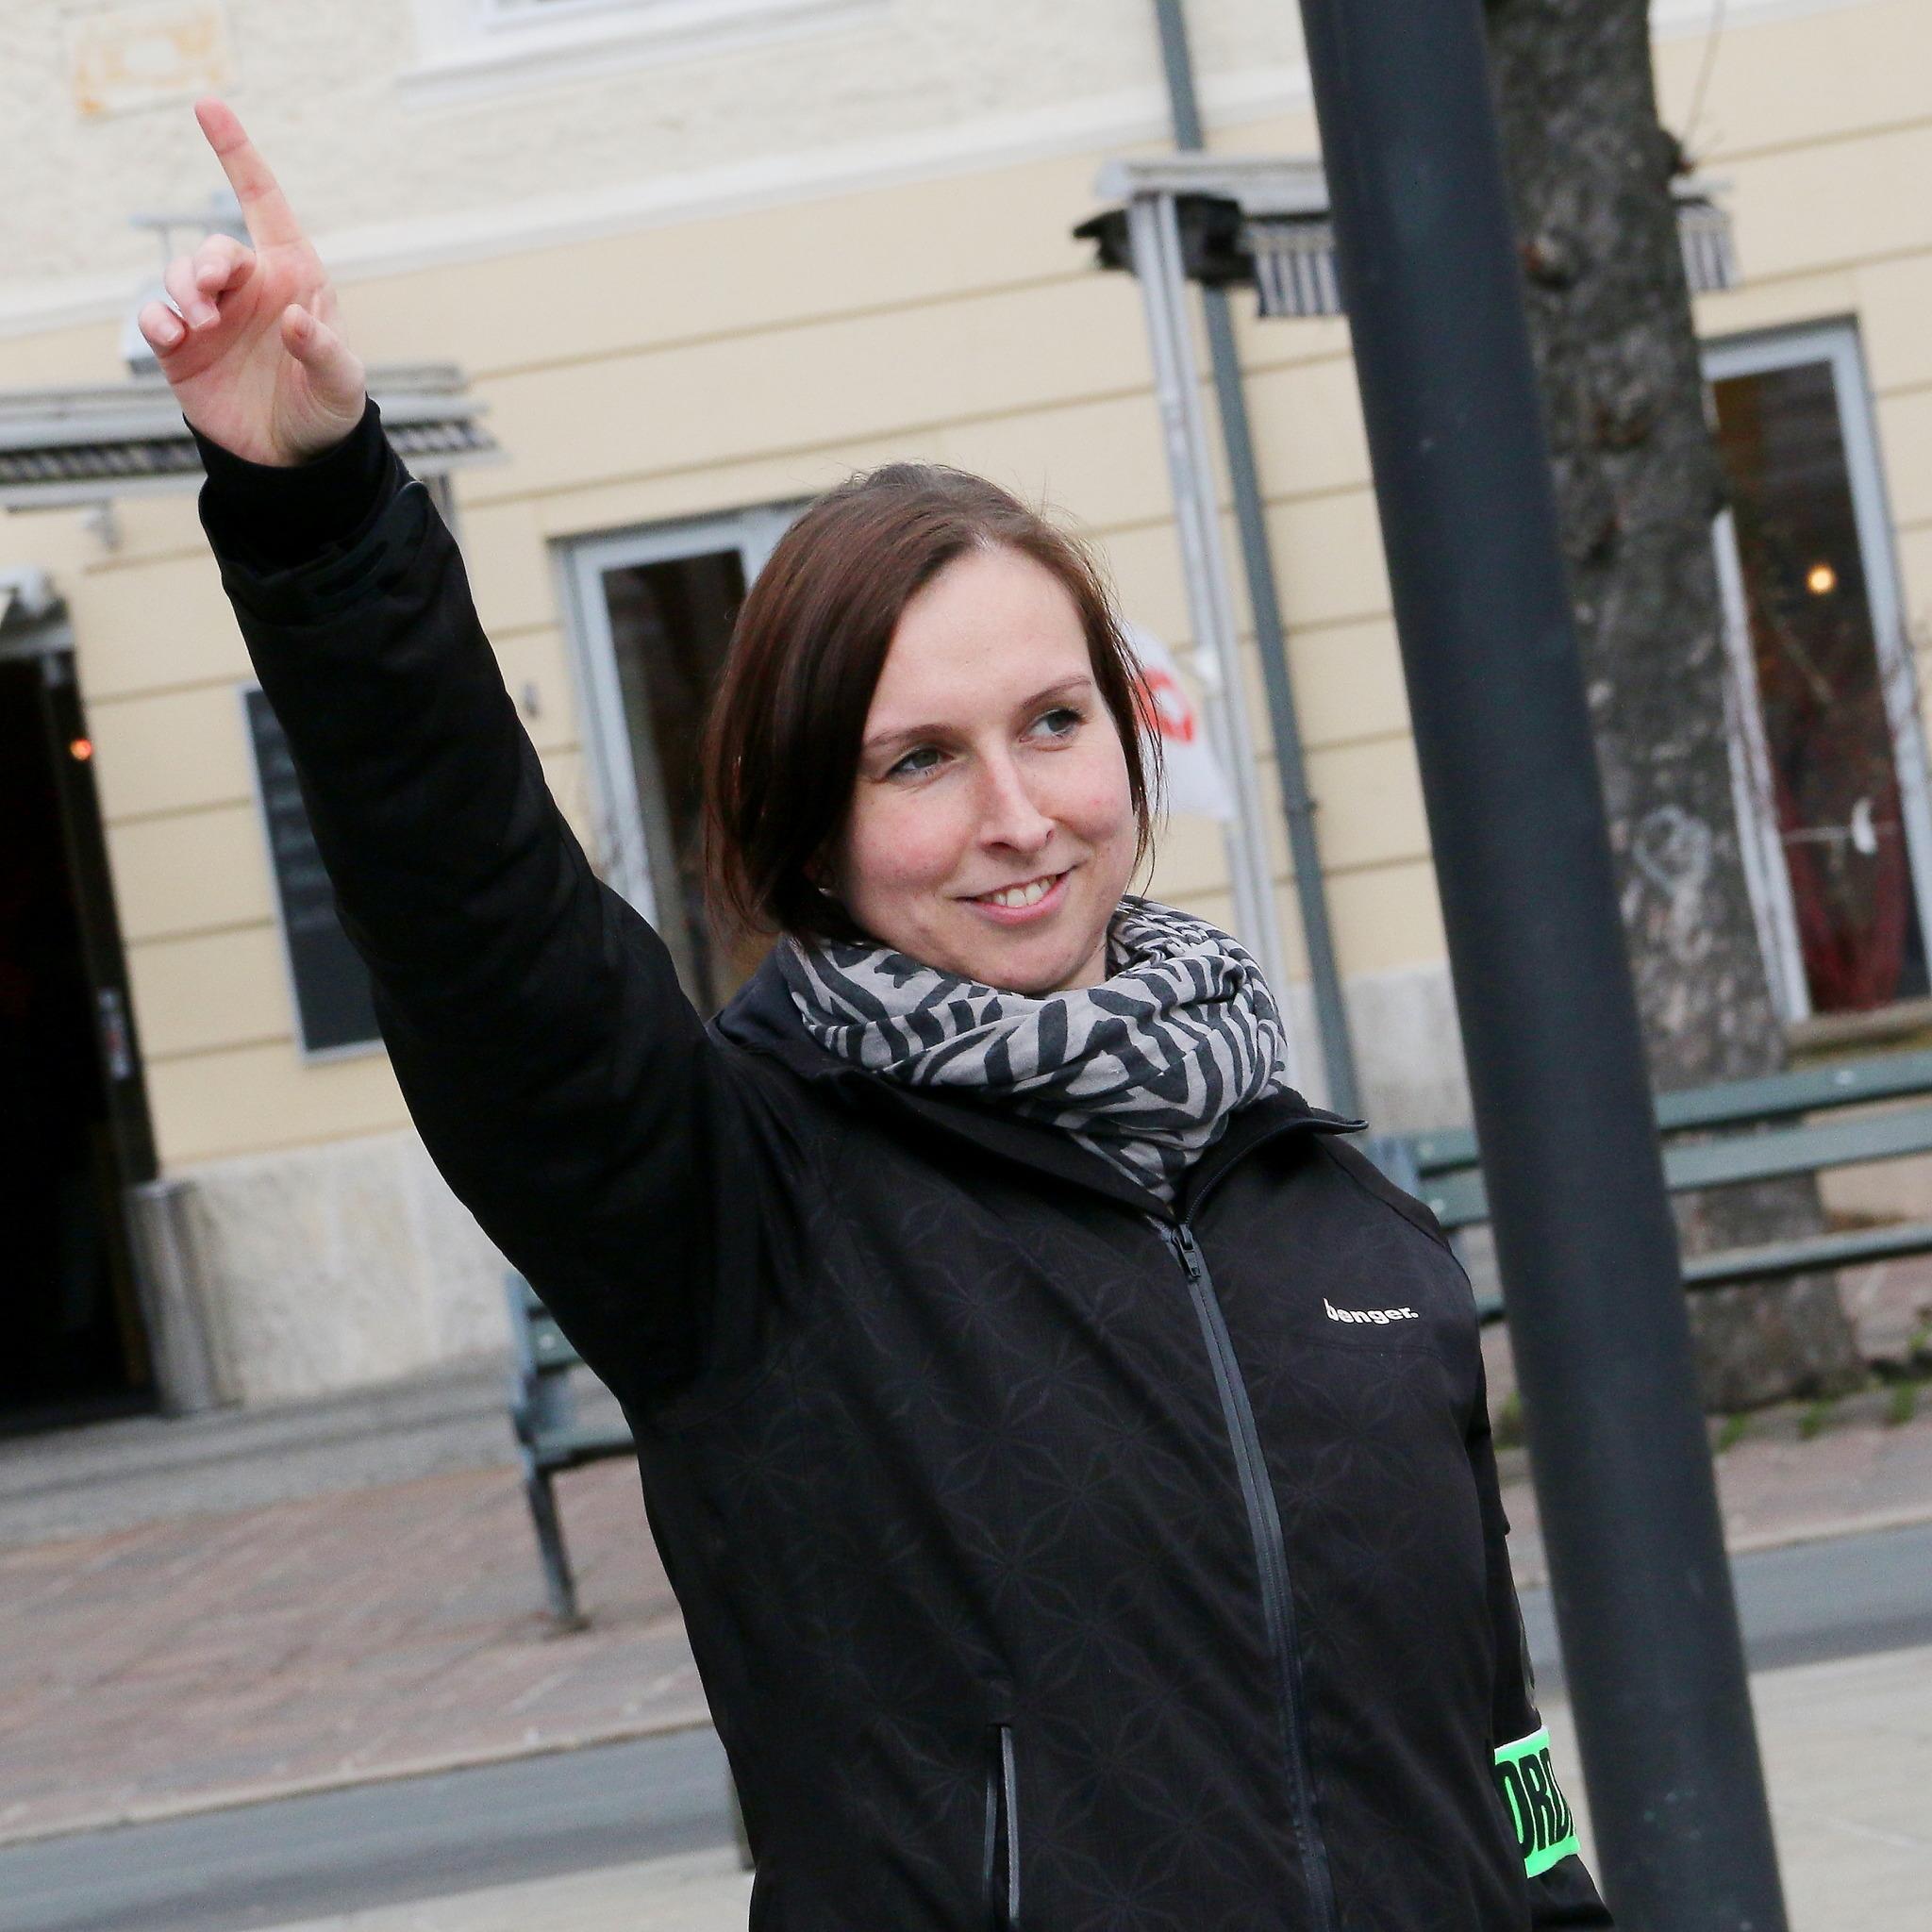 Hernals dating agentur Meine stadt partnersuche lurnfeld